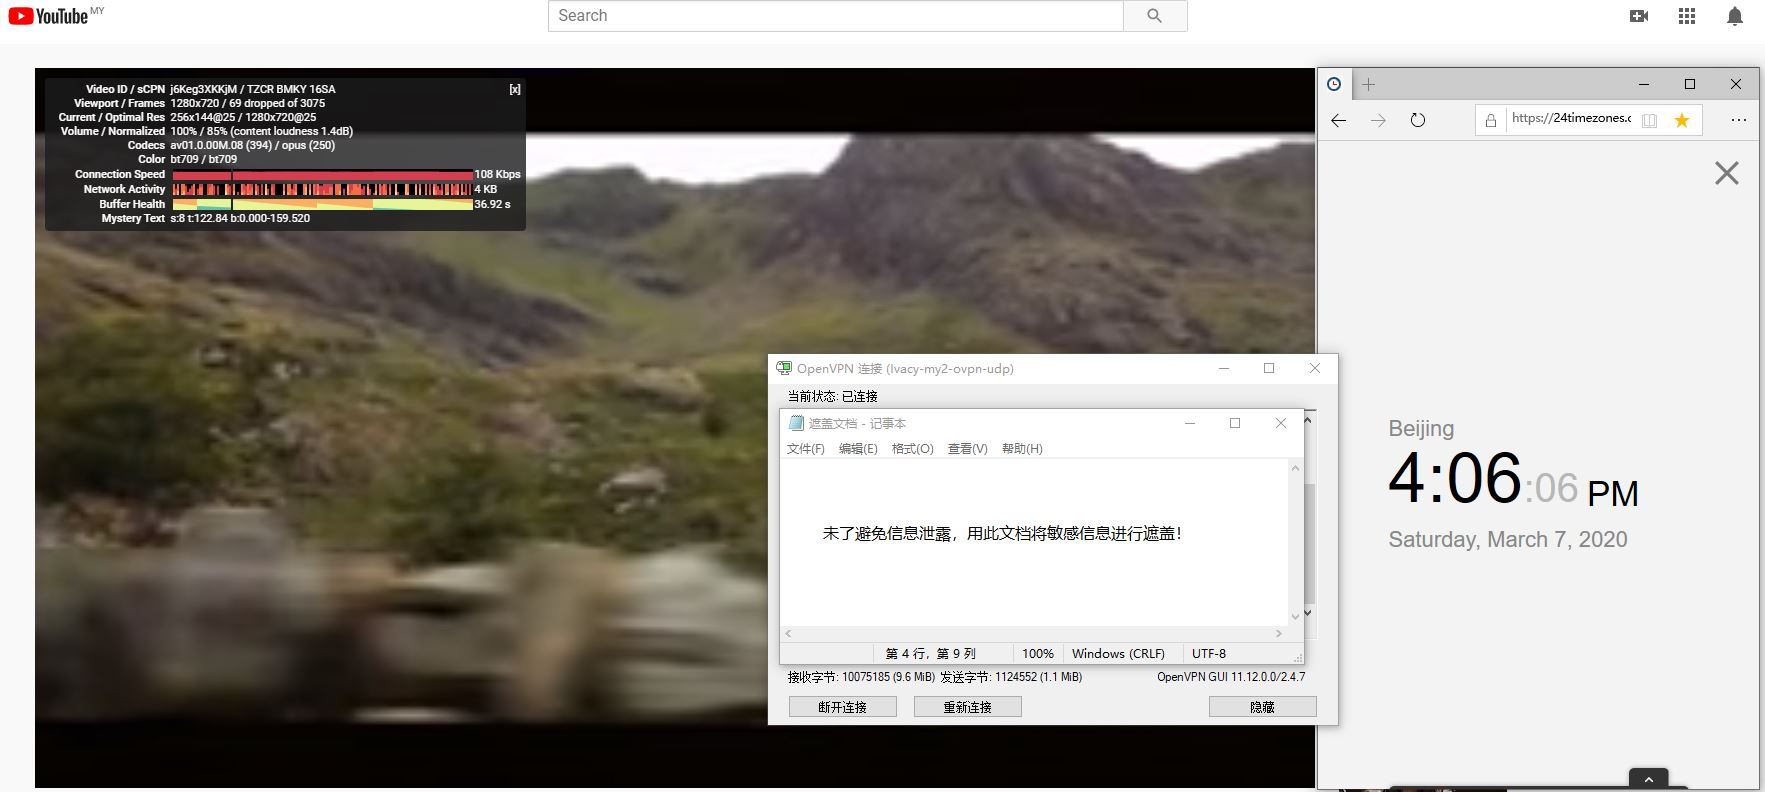 Windows10 IvacyVPN OpenVPN MY2 中国VPN翻墙 科学上网 Youtube测速 - 20200307